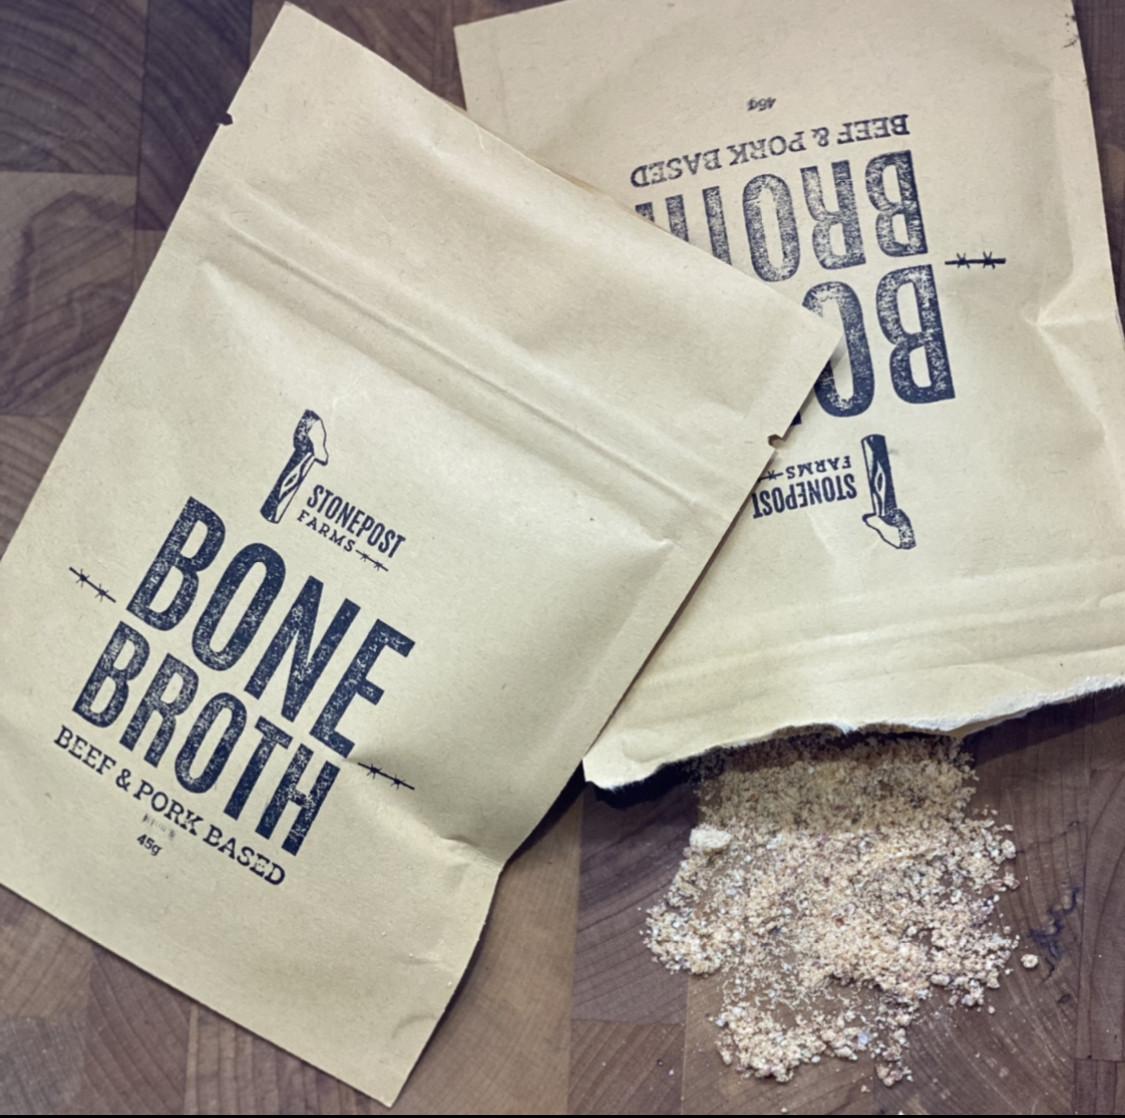 Bone Broth Powder - Seasoned